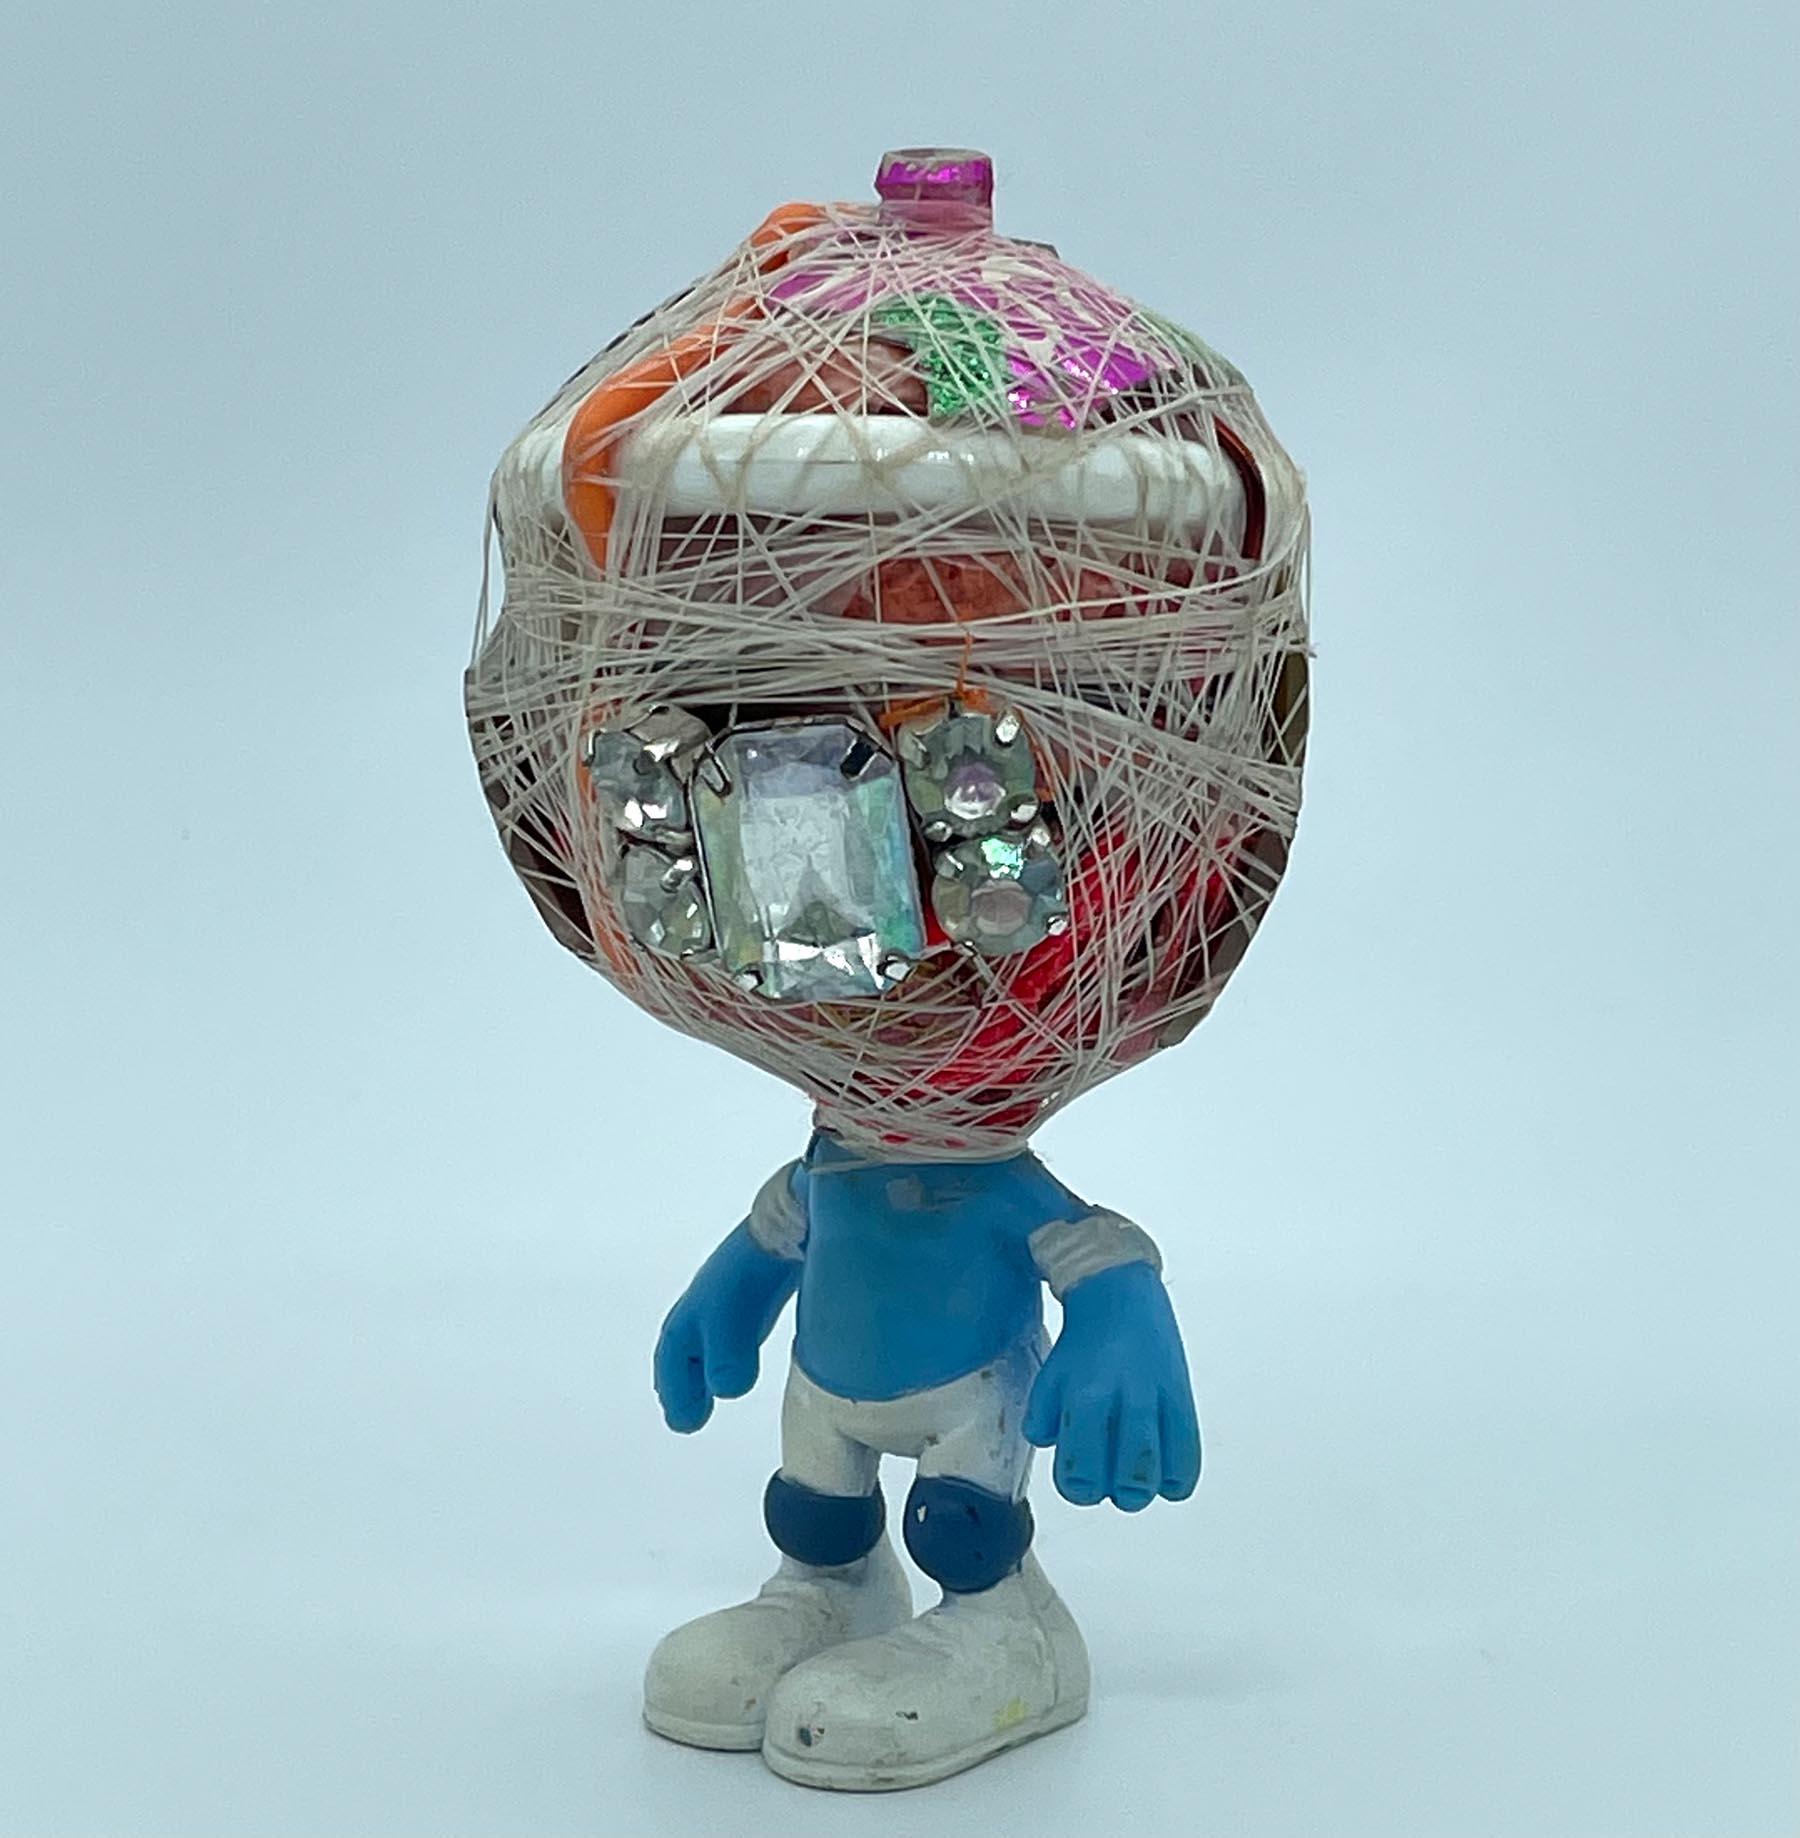 junk art, recycled material, sculptures, sculptor, dumpsters, saving, resources,